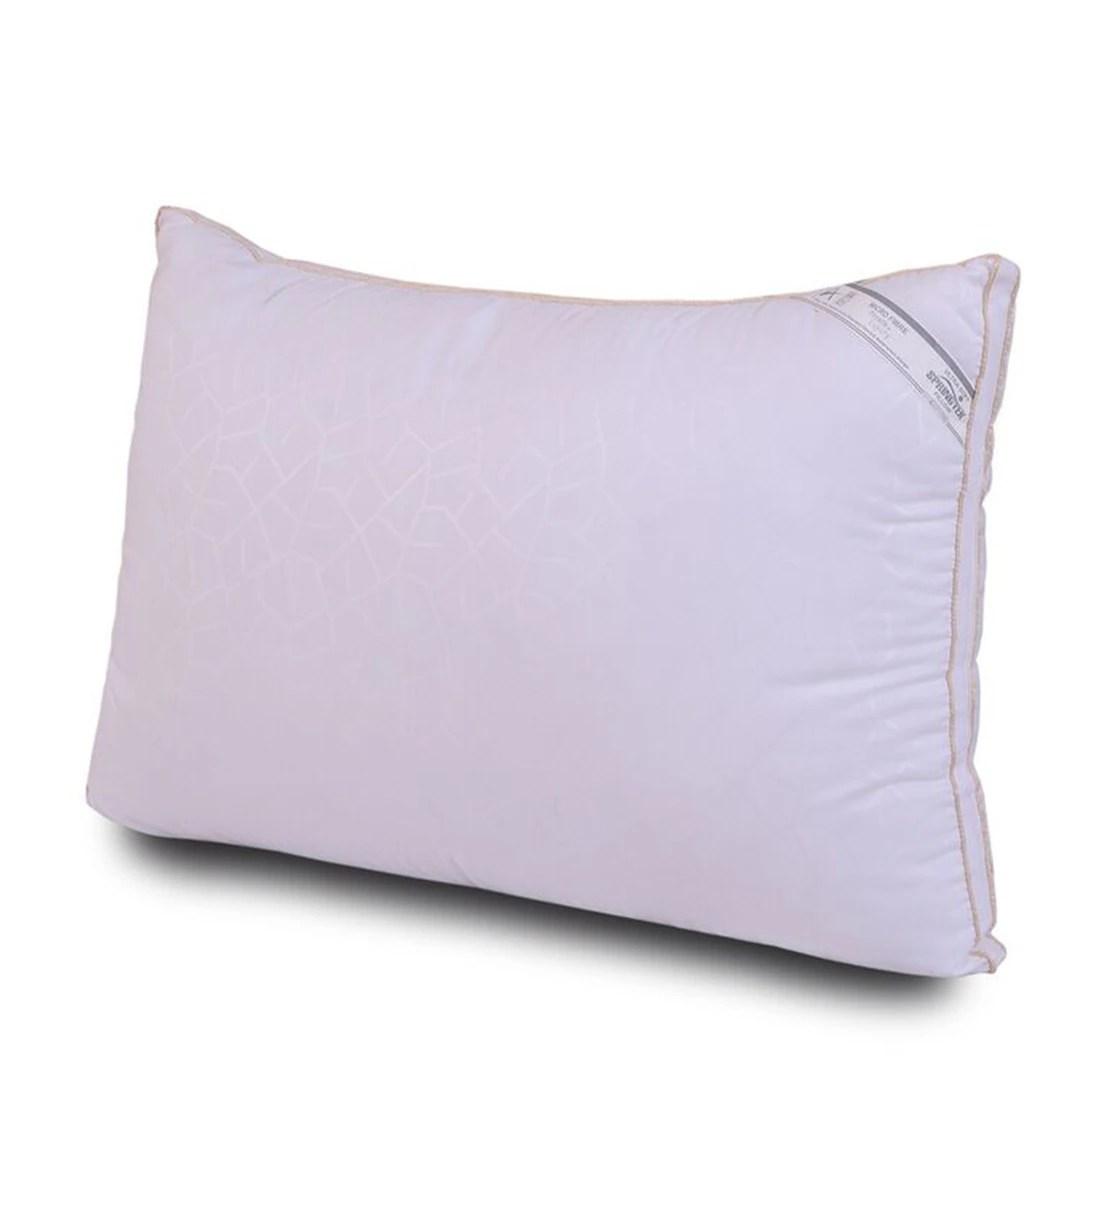 luxurious micro fibre single pillow insert 21x31